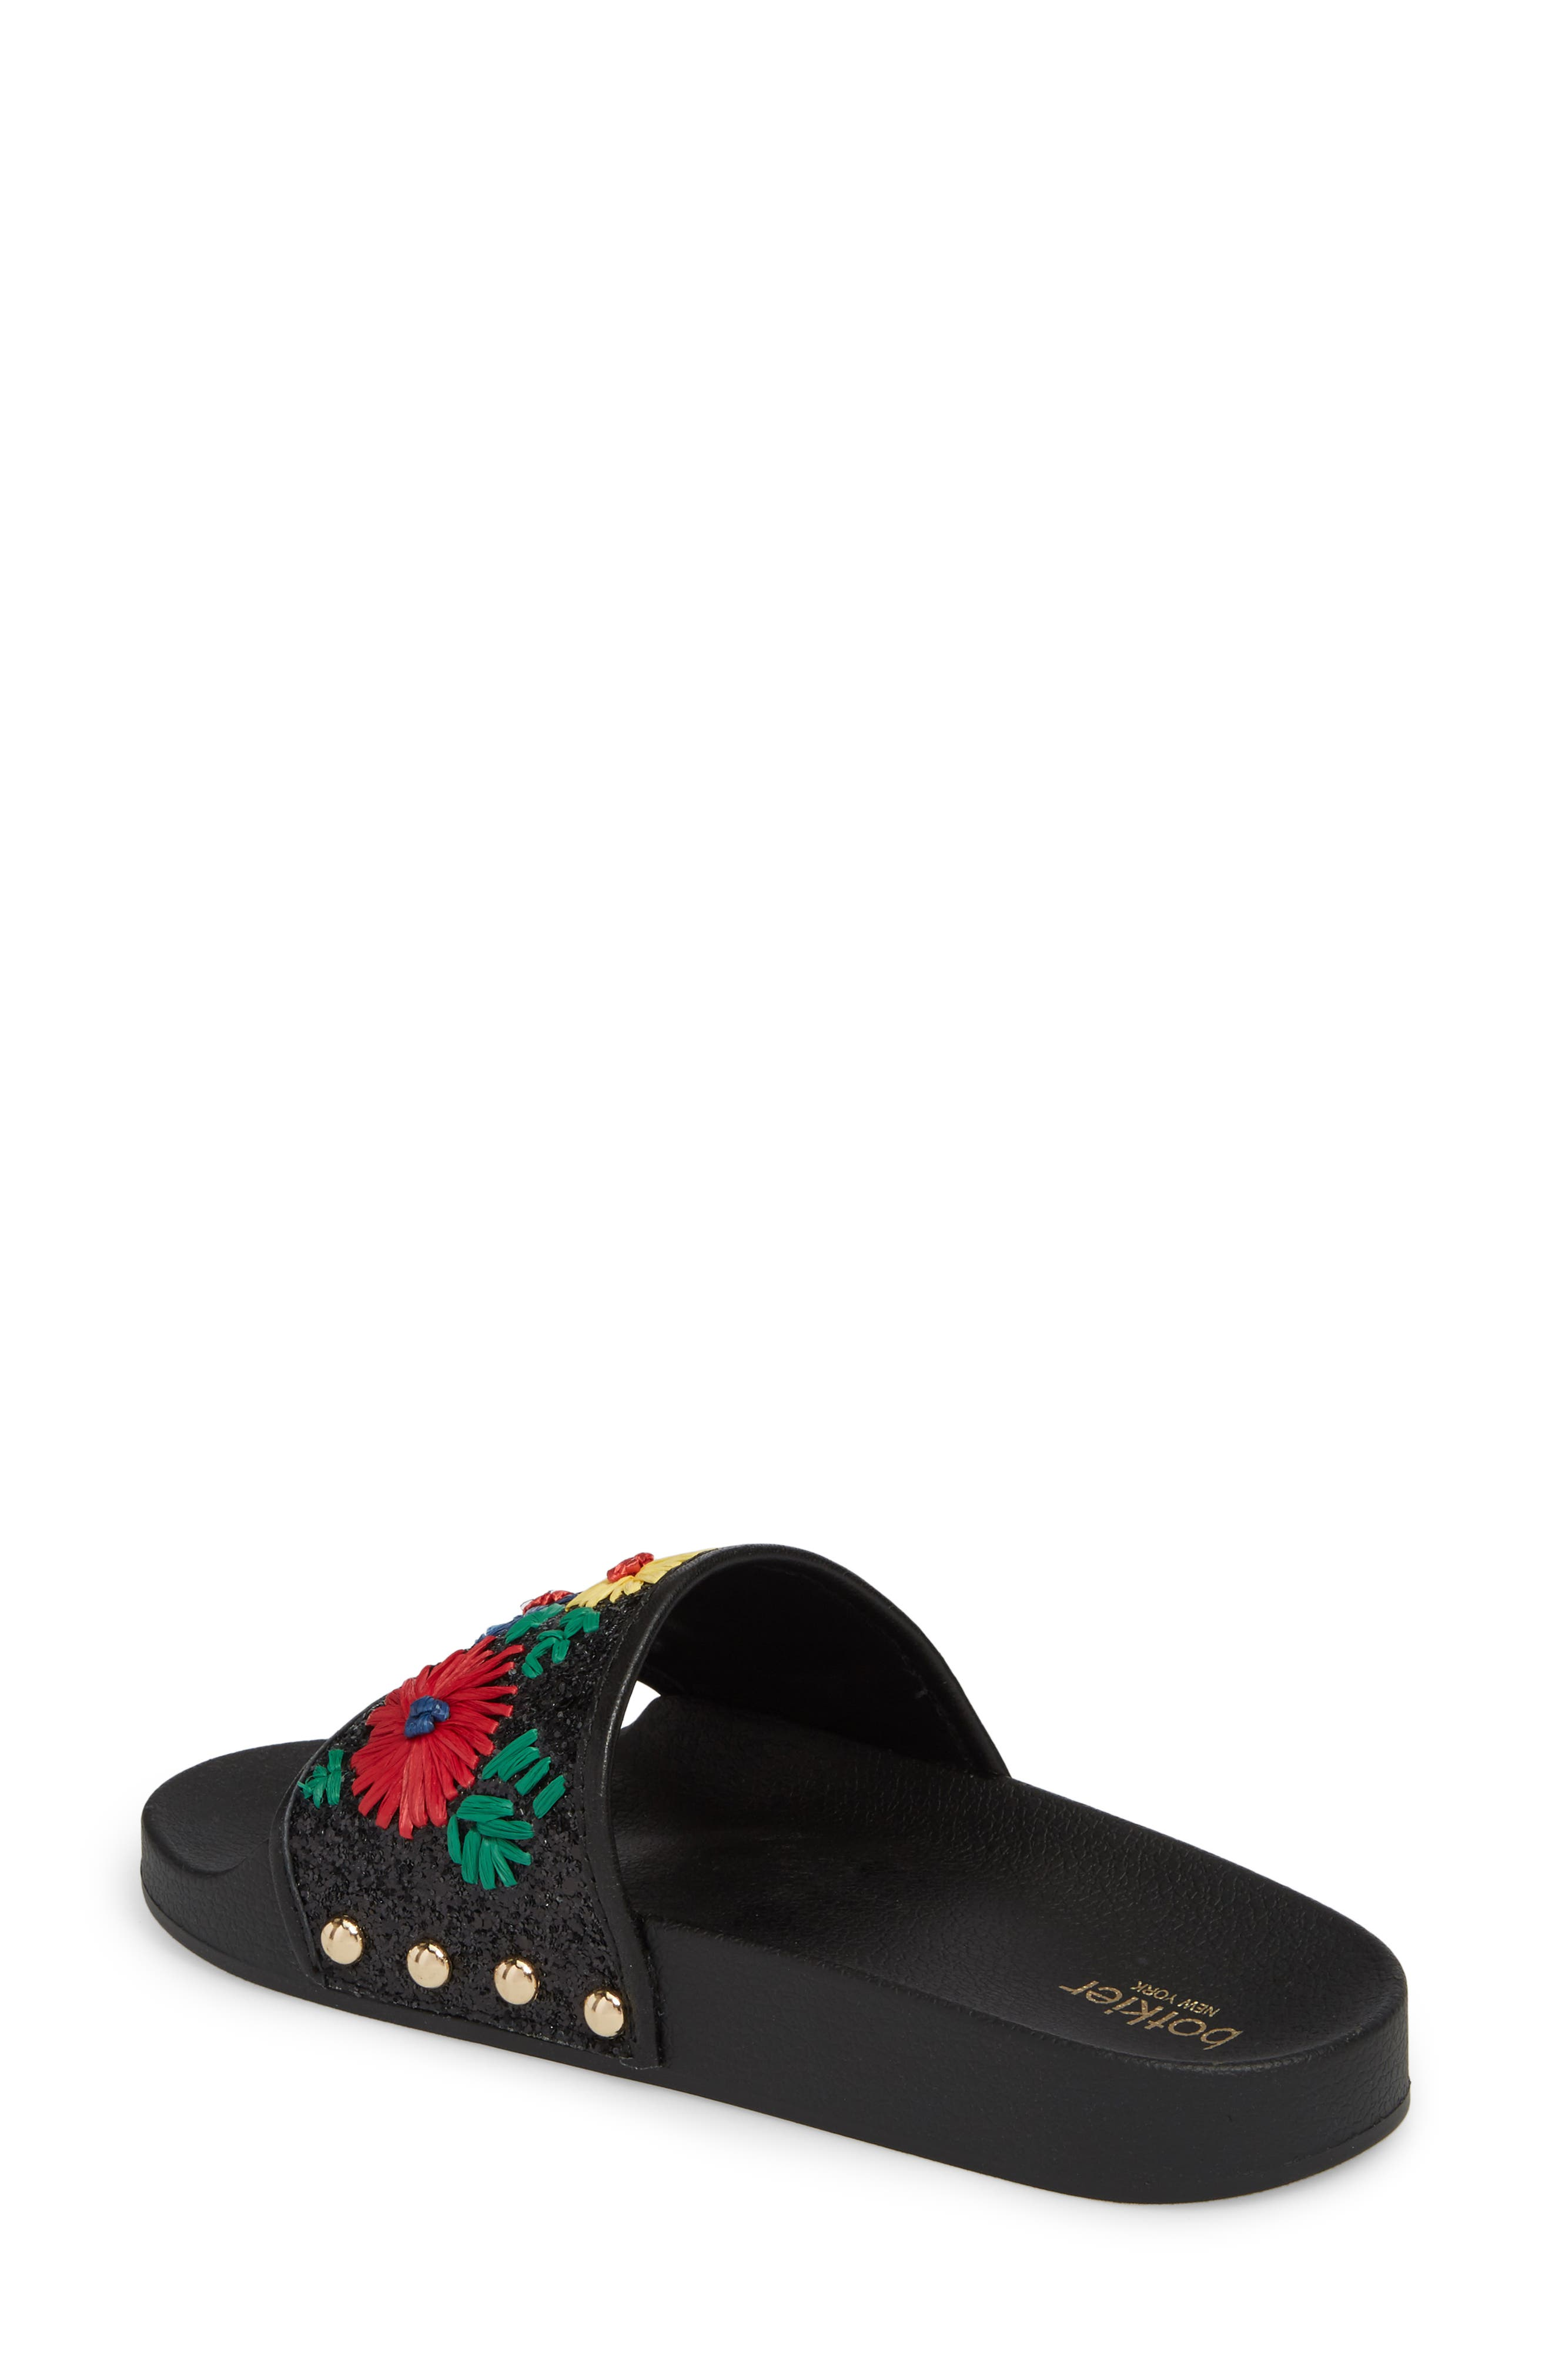 Daisy Slide Sandal,                             Alternate thumbnail 2, color,                             BRIGHT FLORAL PRINT